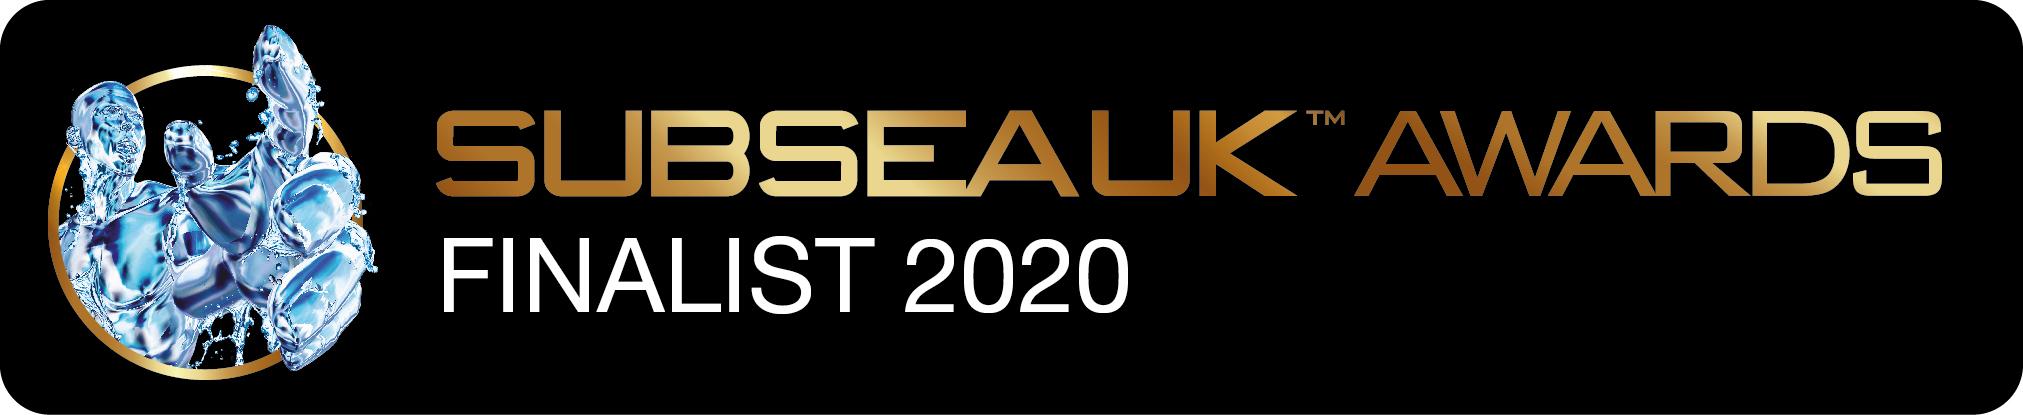 15536 Subsea UK Awards Finalist-logo-2020-300dpi[1].jpg